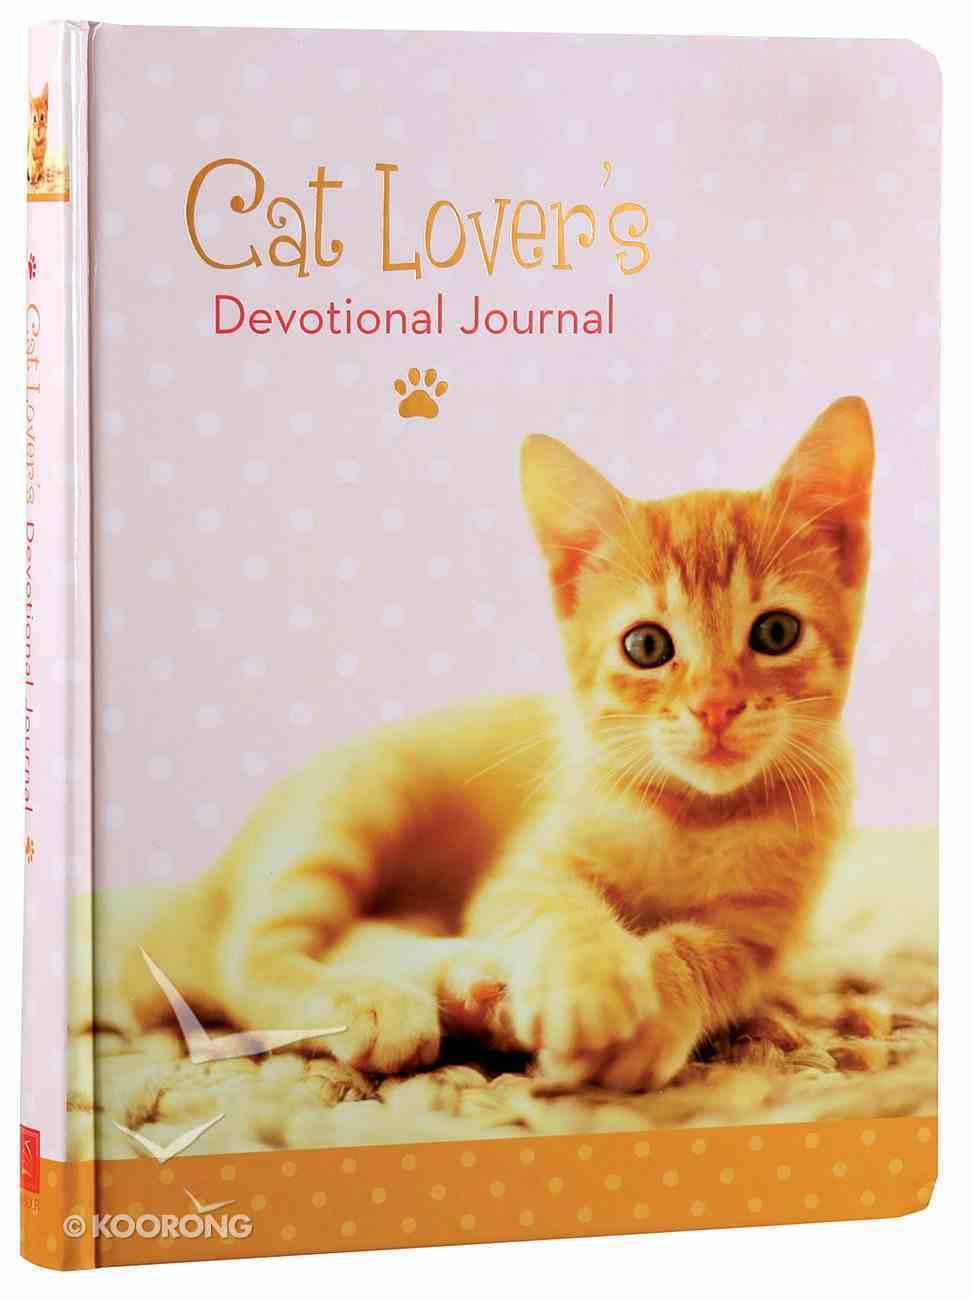 Cat Lover's Devotional Journal Hardback